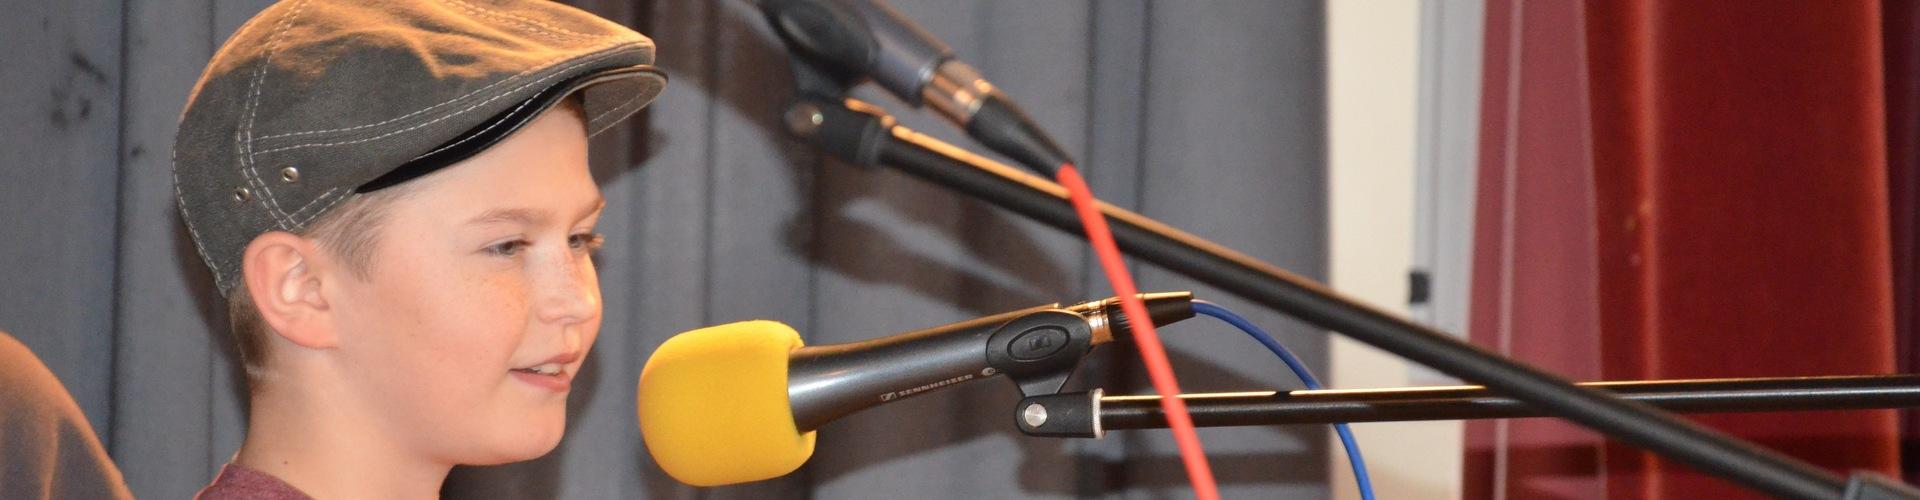 BLM-Schulradiotag in München